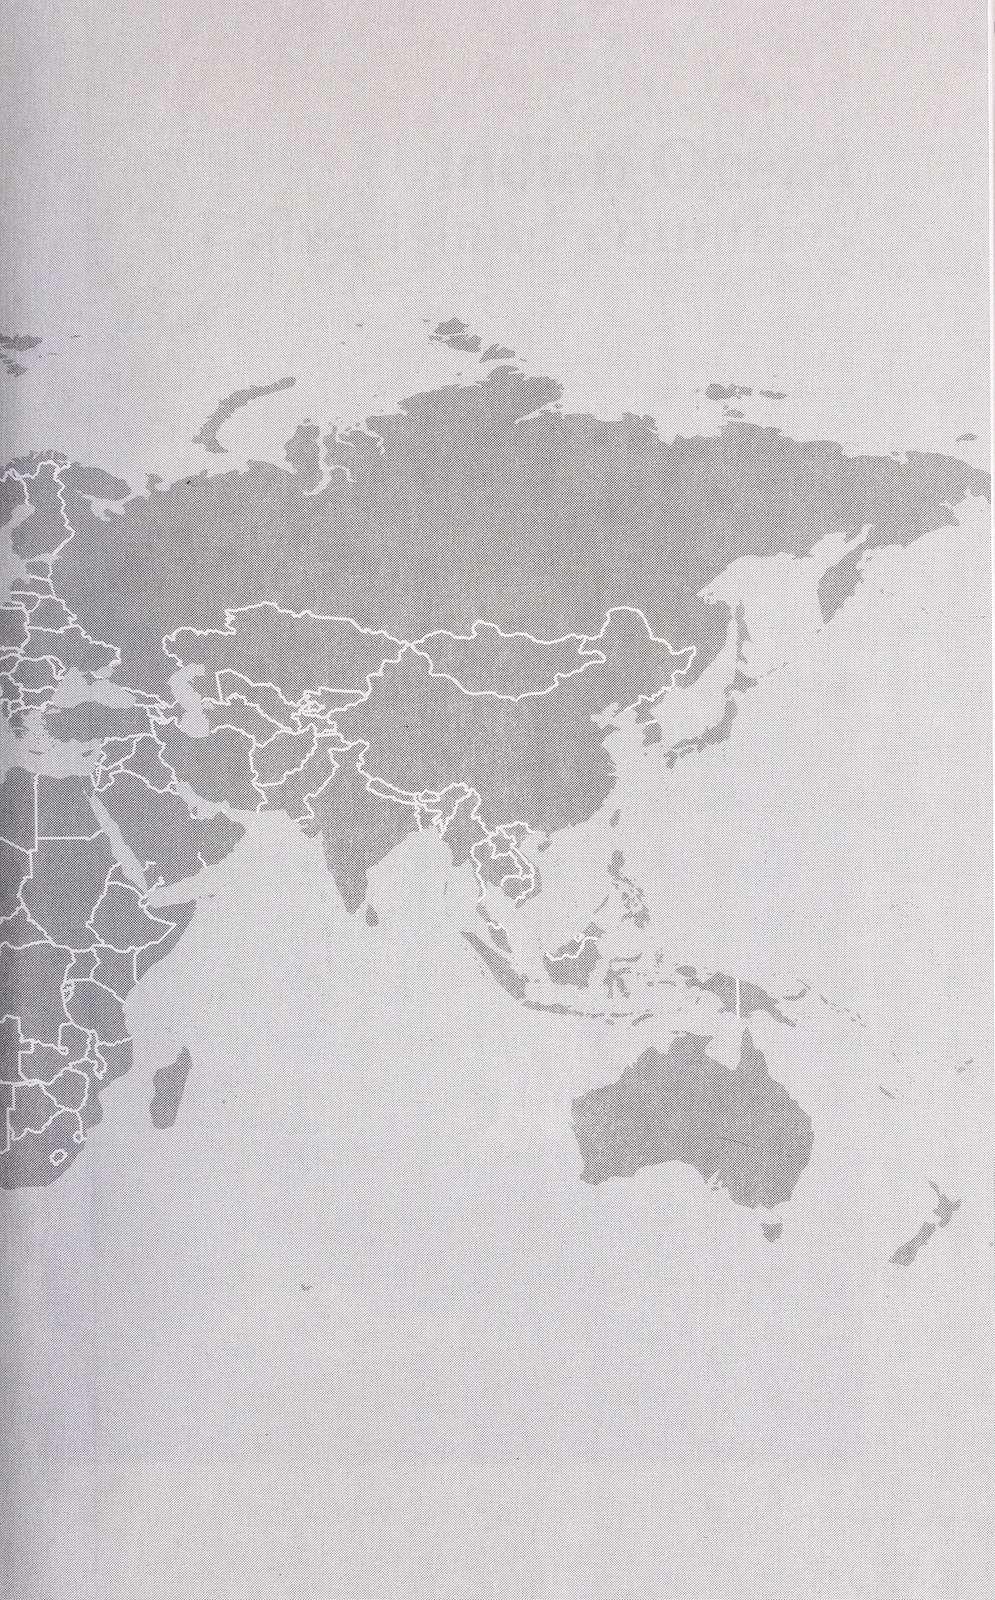 Indian Ocean : five island countries